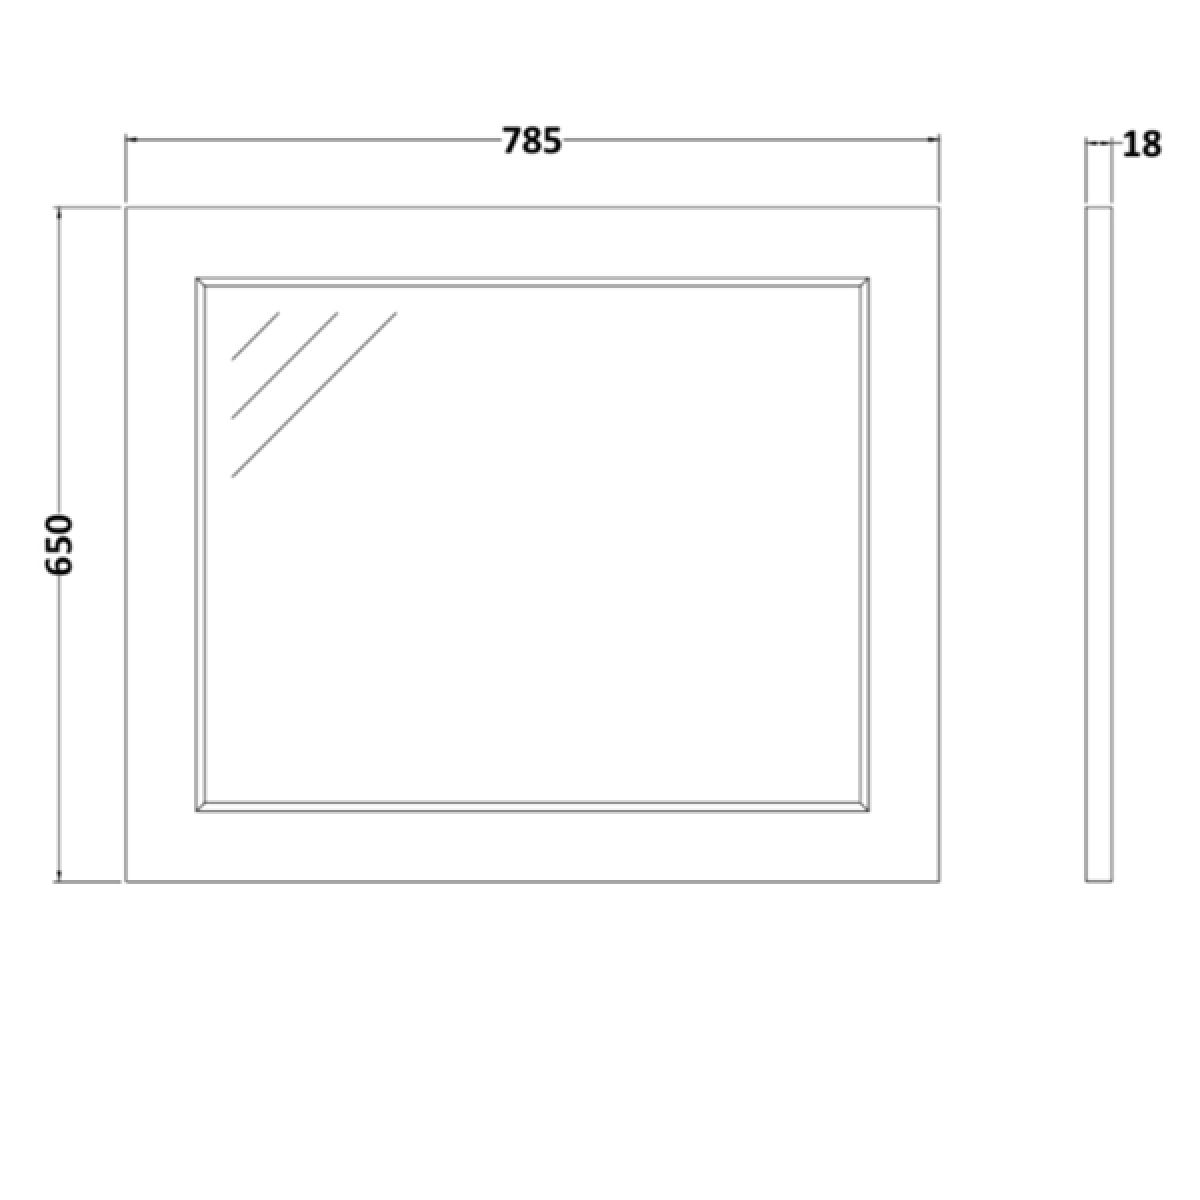 RAK Washington Black Bathroom Mirror 800mm Measurements